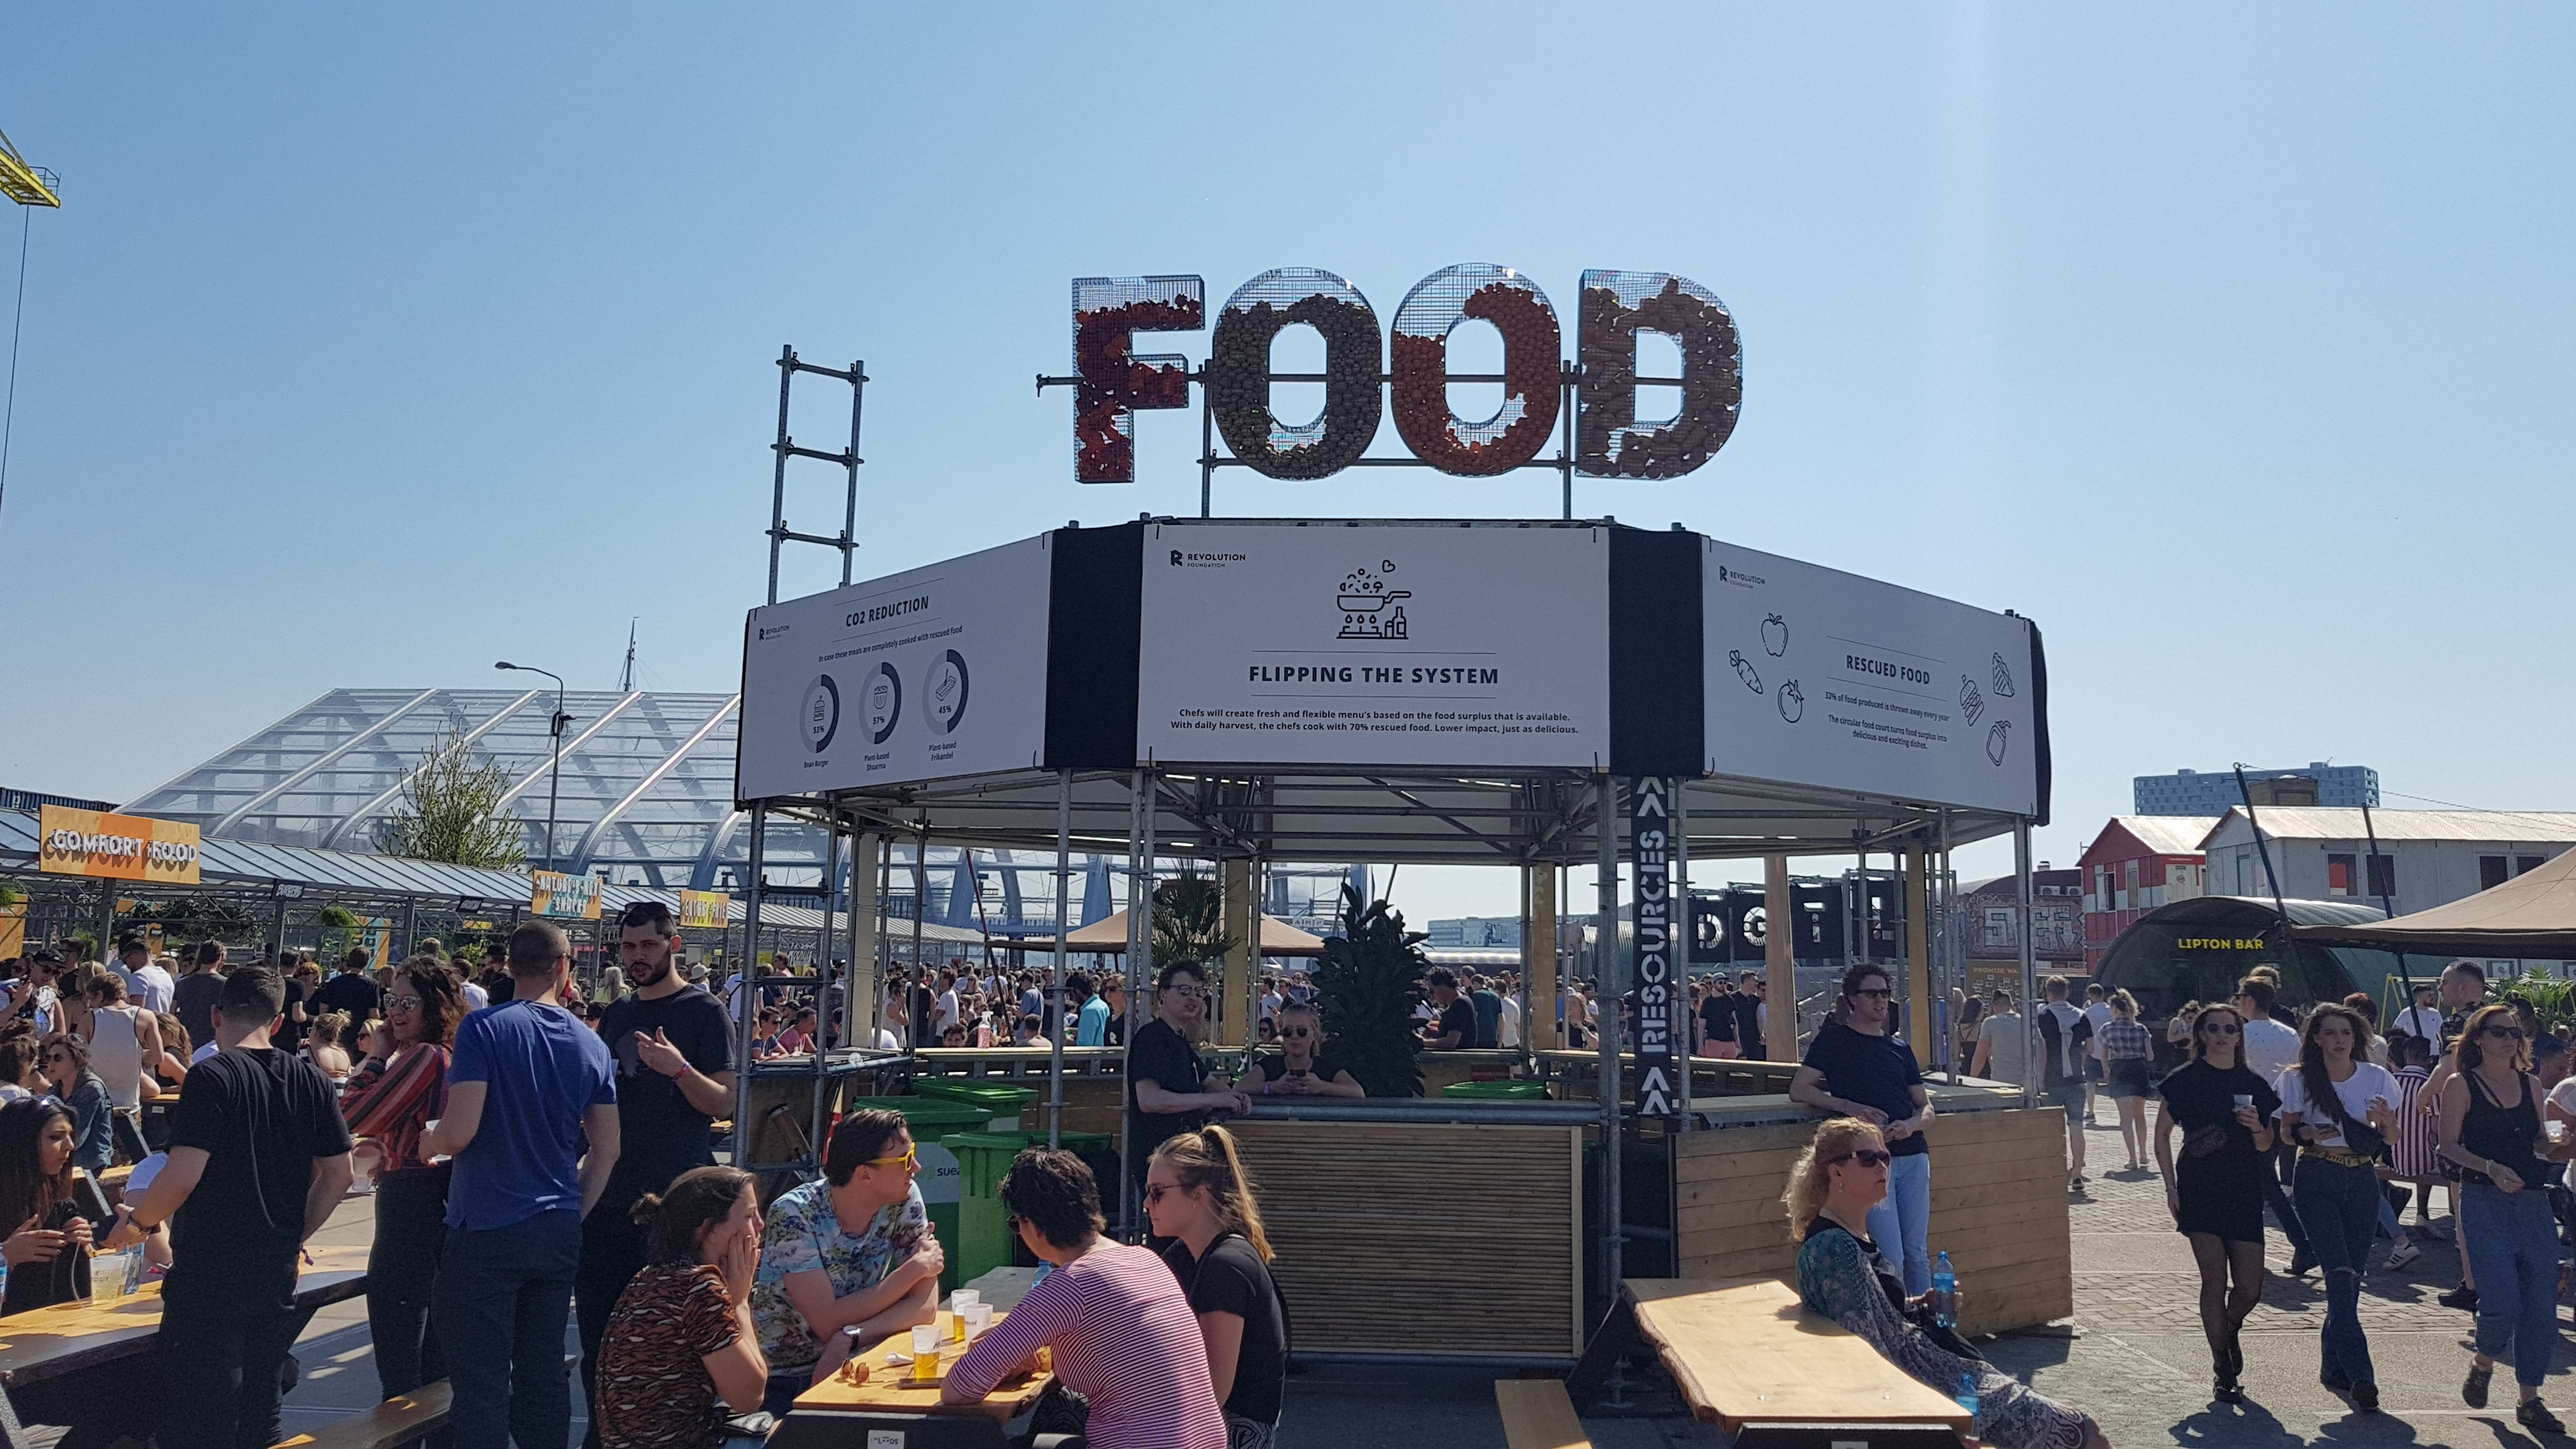 Circulaire Foodcourt op festivalterrein DGTL